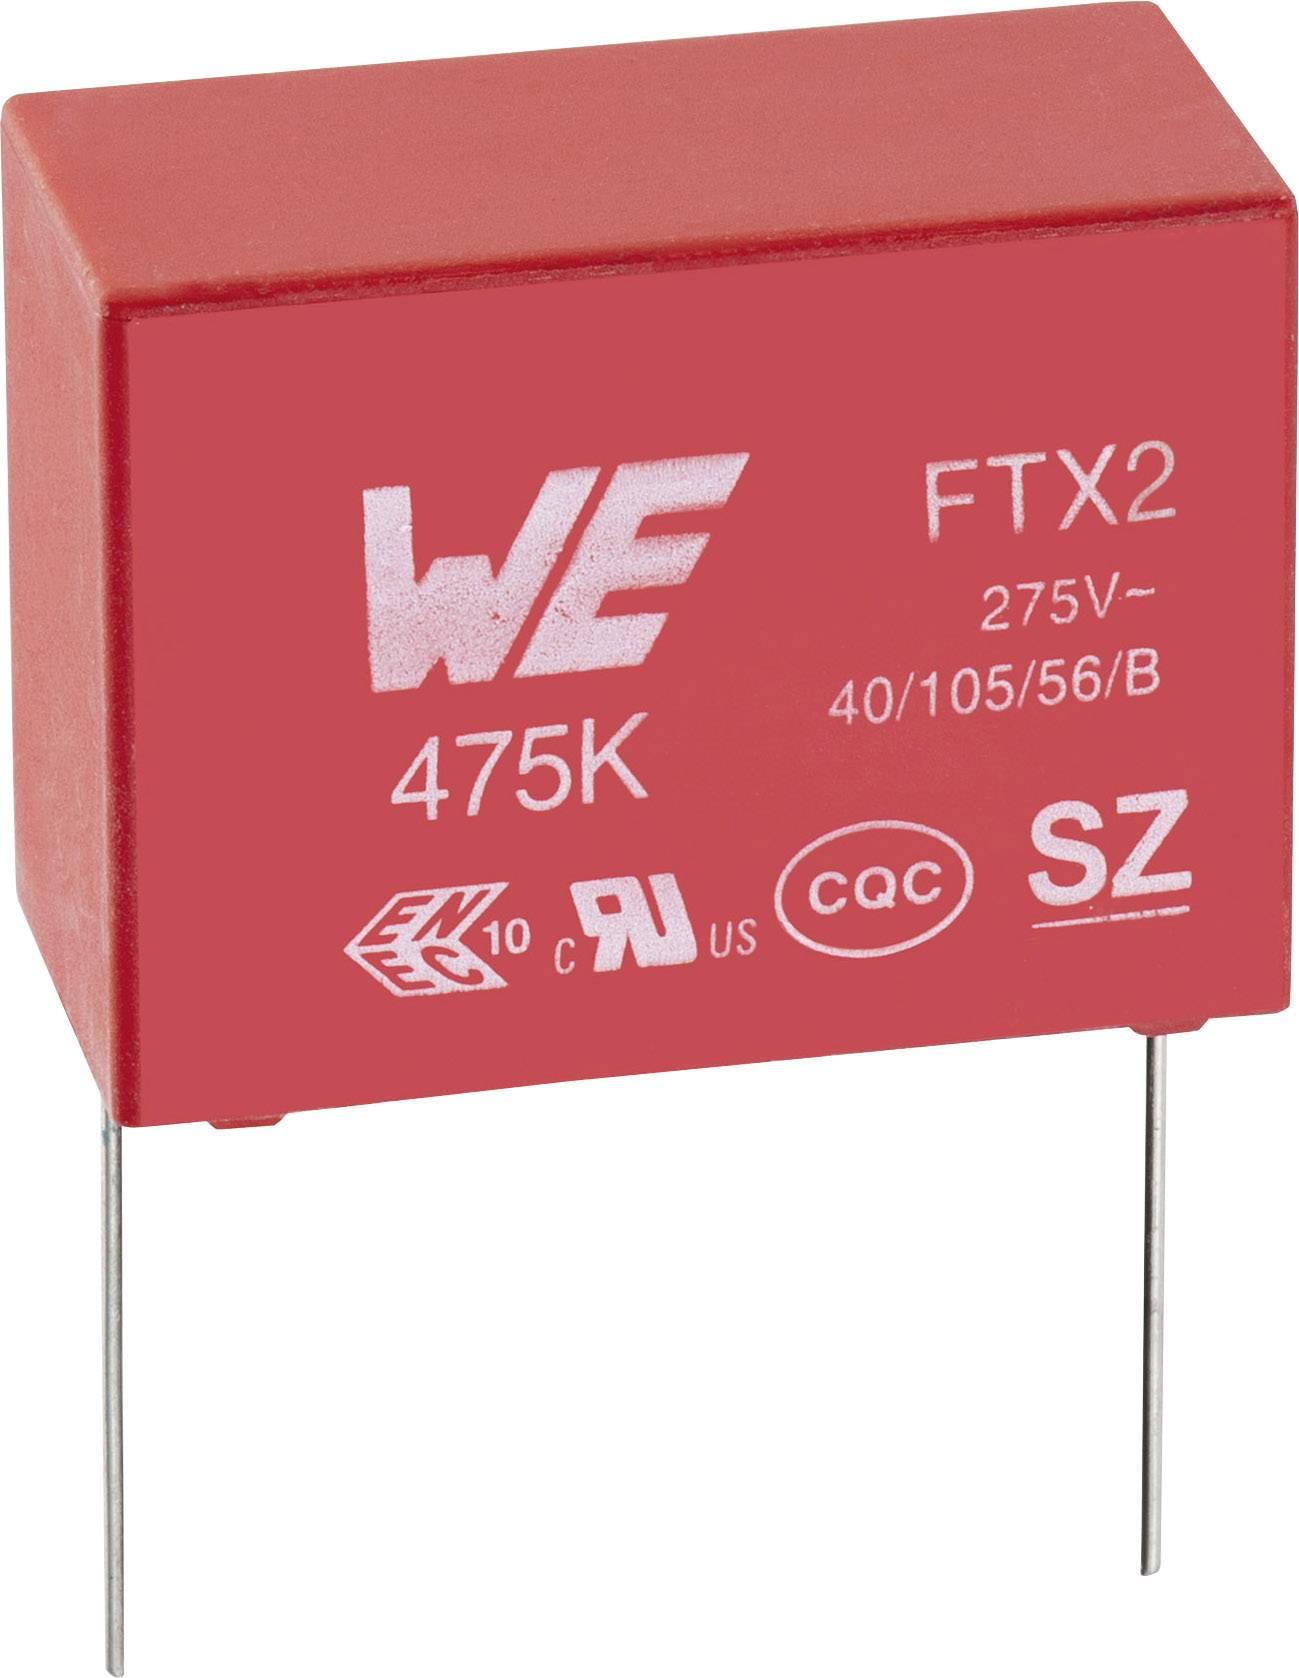 Fóliový kondenzátor Würth WCAP-FTX2, 890324023023CS, 100000 pF, 275 V / AC, 10%, RM 10 mm